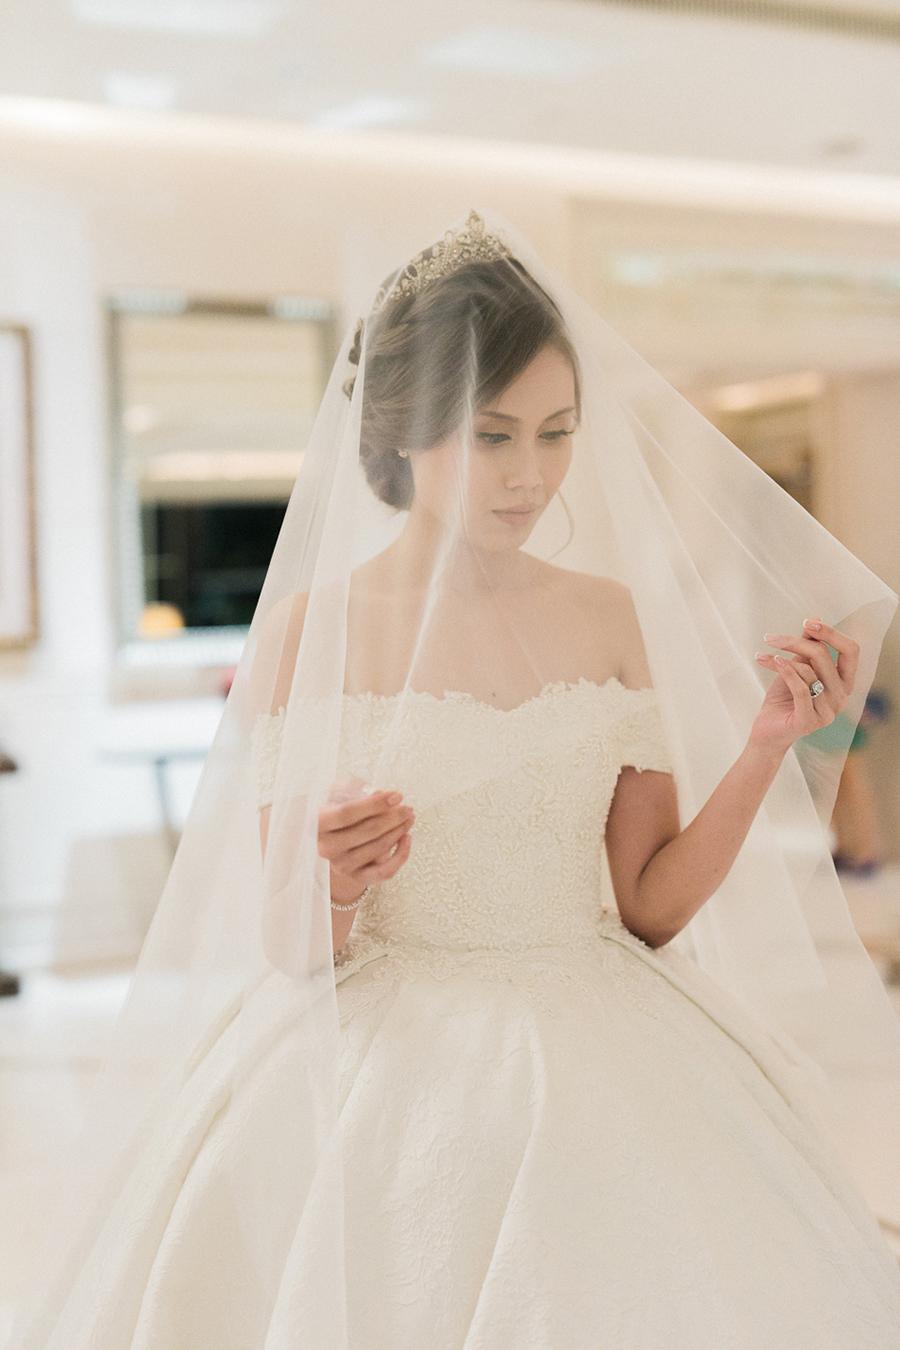 Chen_Sands_Photo_Destination_Wedding_Photographer_StRegis_Singapore-4.jpg